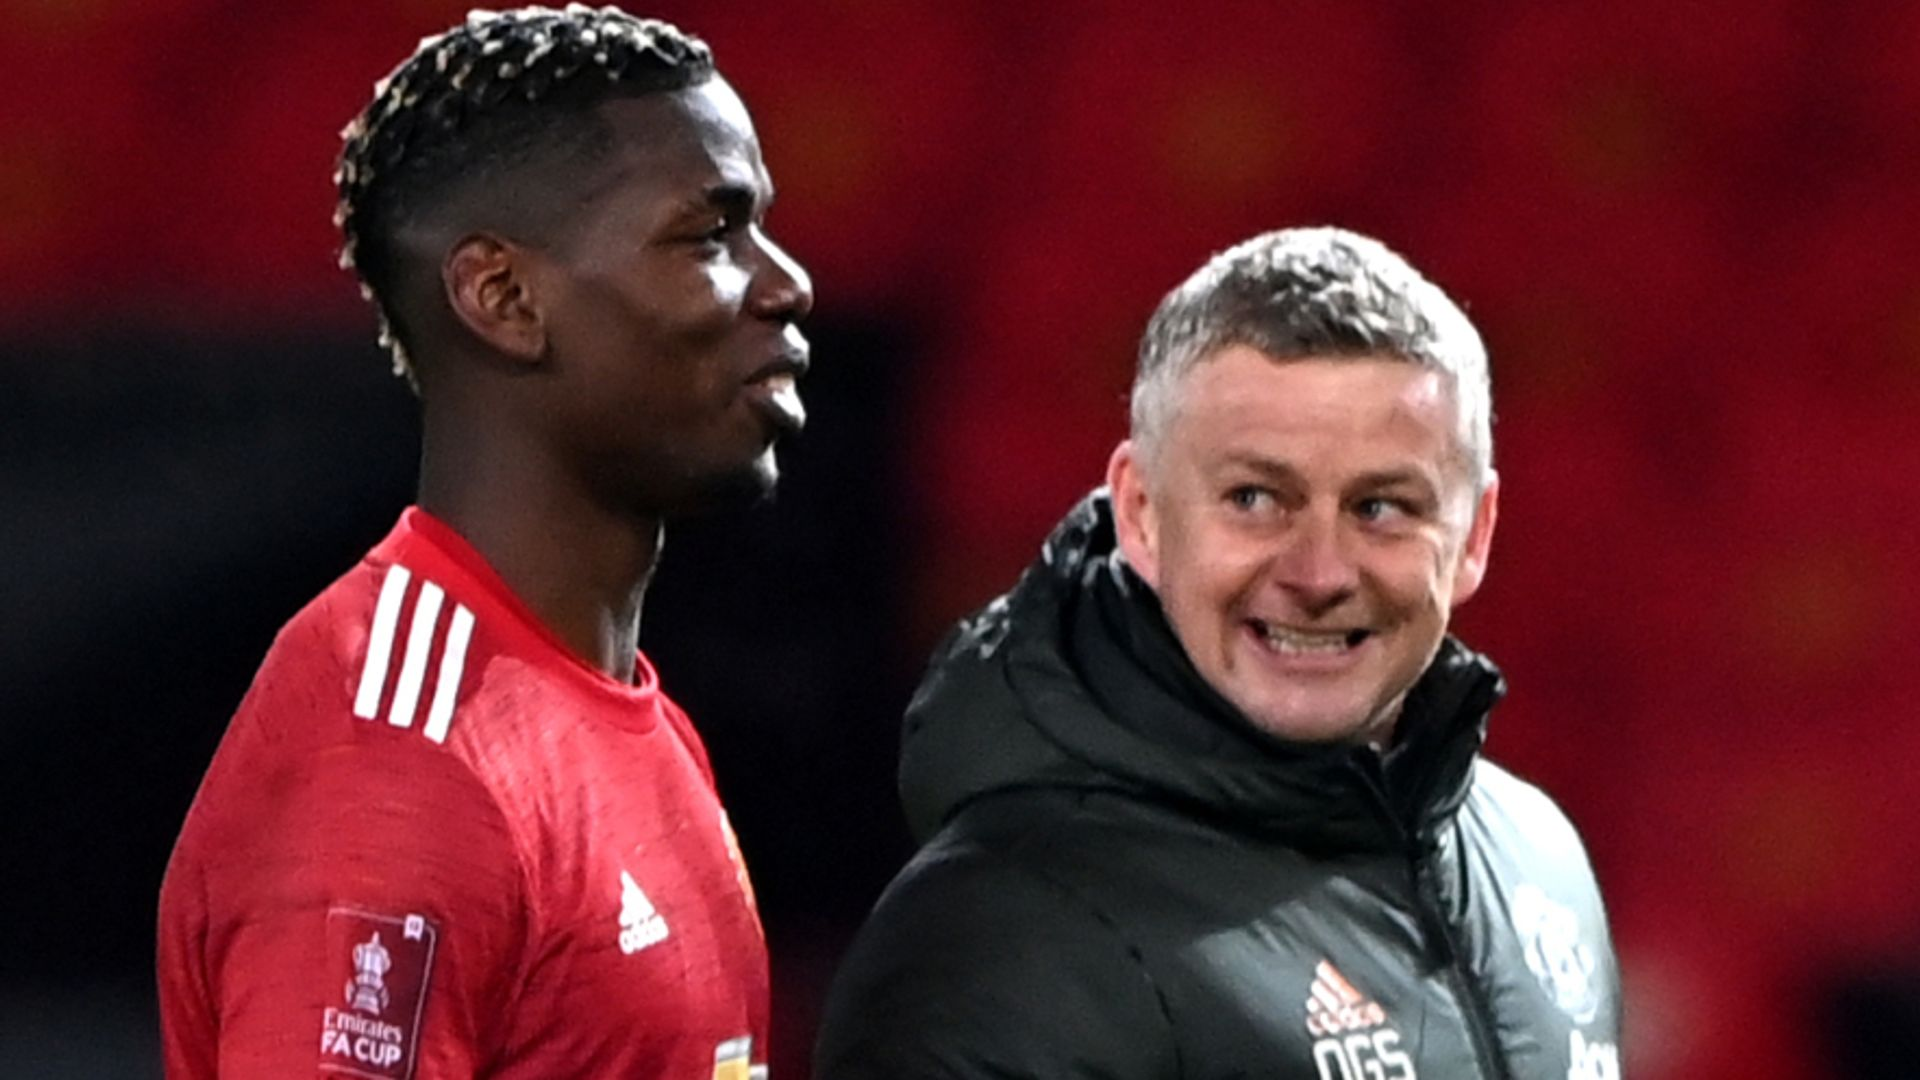 Solskjaer: Man Utd still in contract talks with Pogba